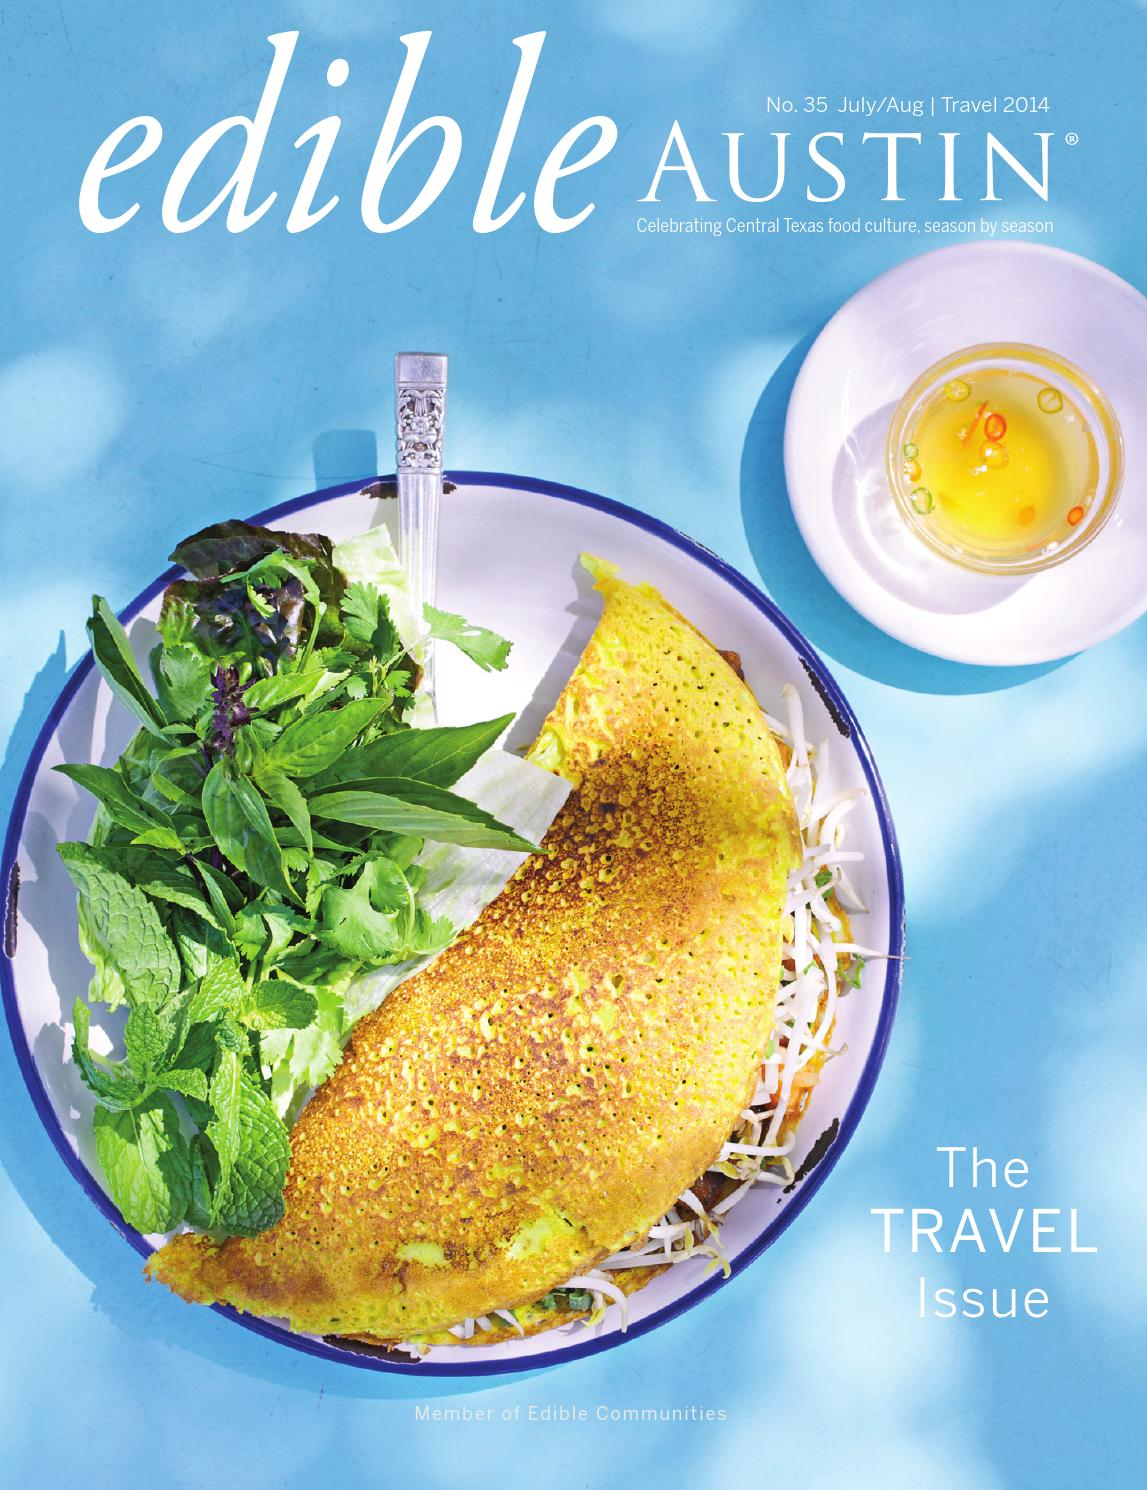 Edible Austin Travel Issue 2014 by Edible Austin - issuu